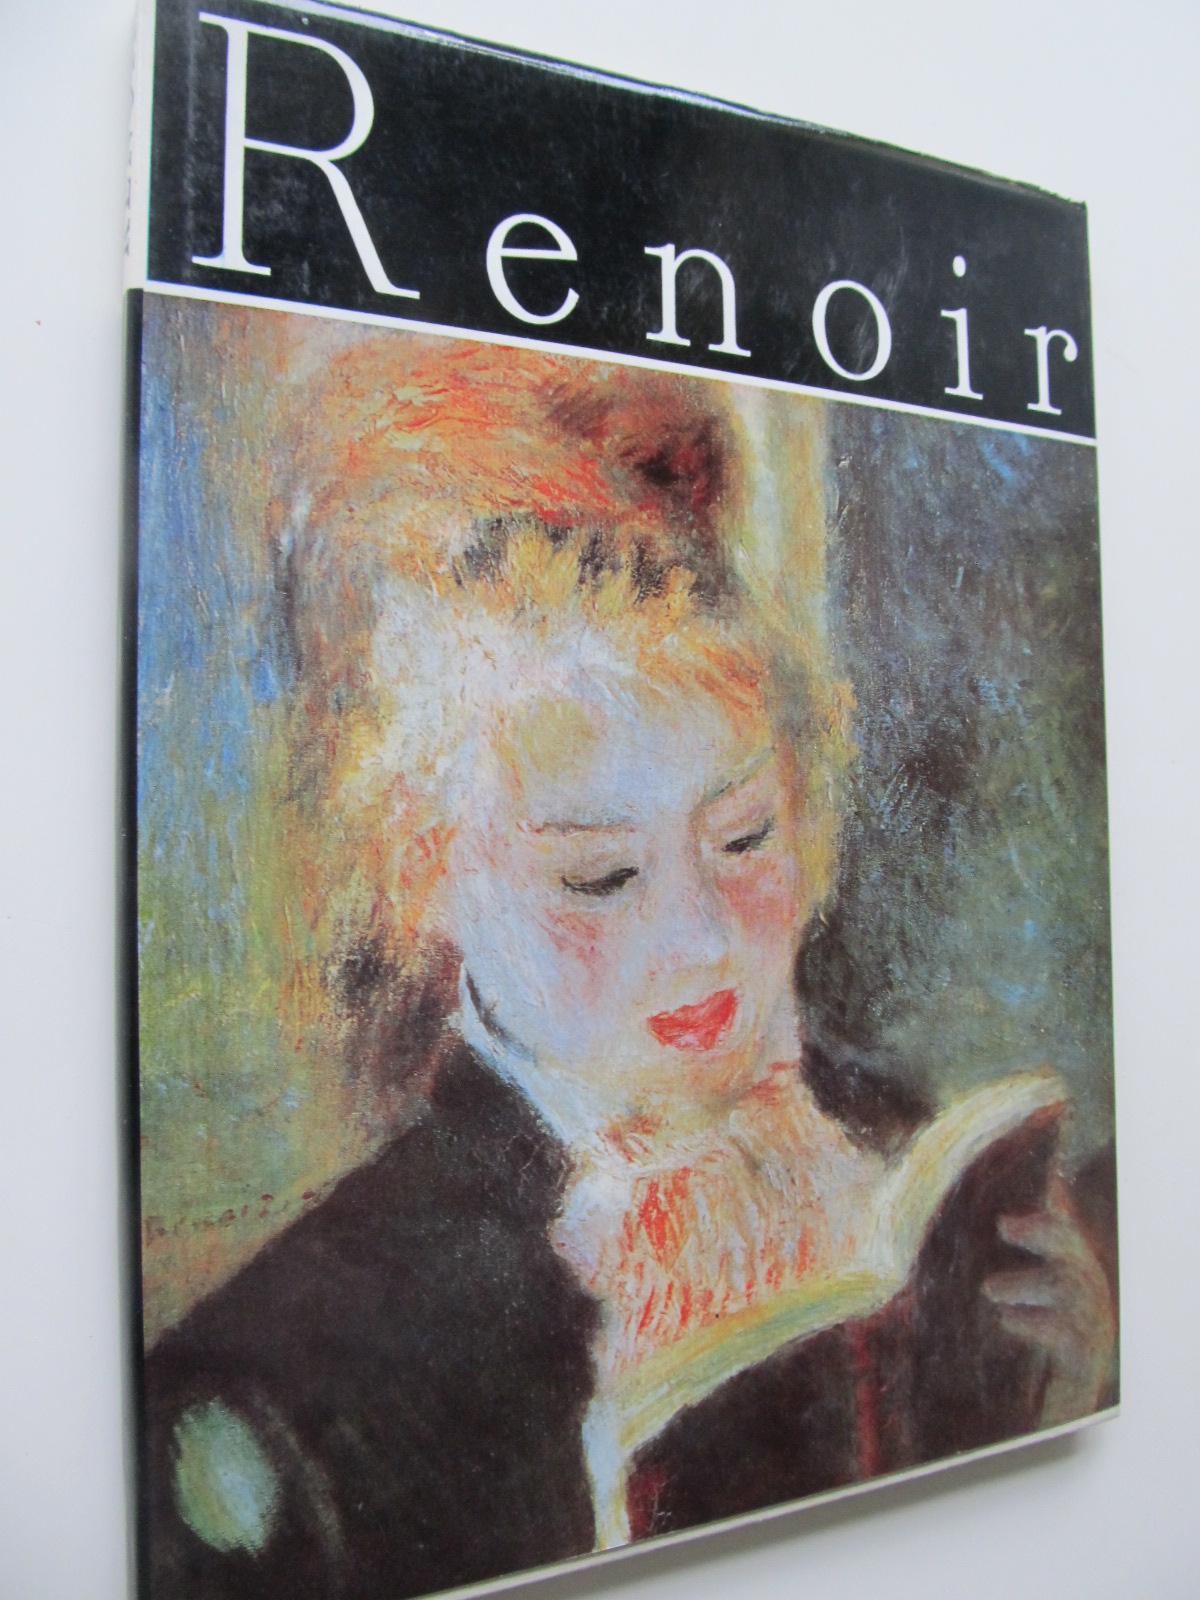 Renoir (Album) - format foarte mare - Constantin Chirculescu | Detalii carte